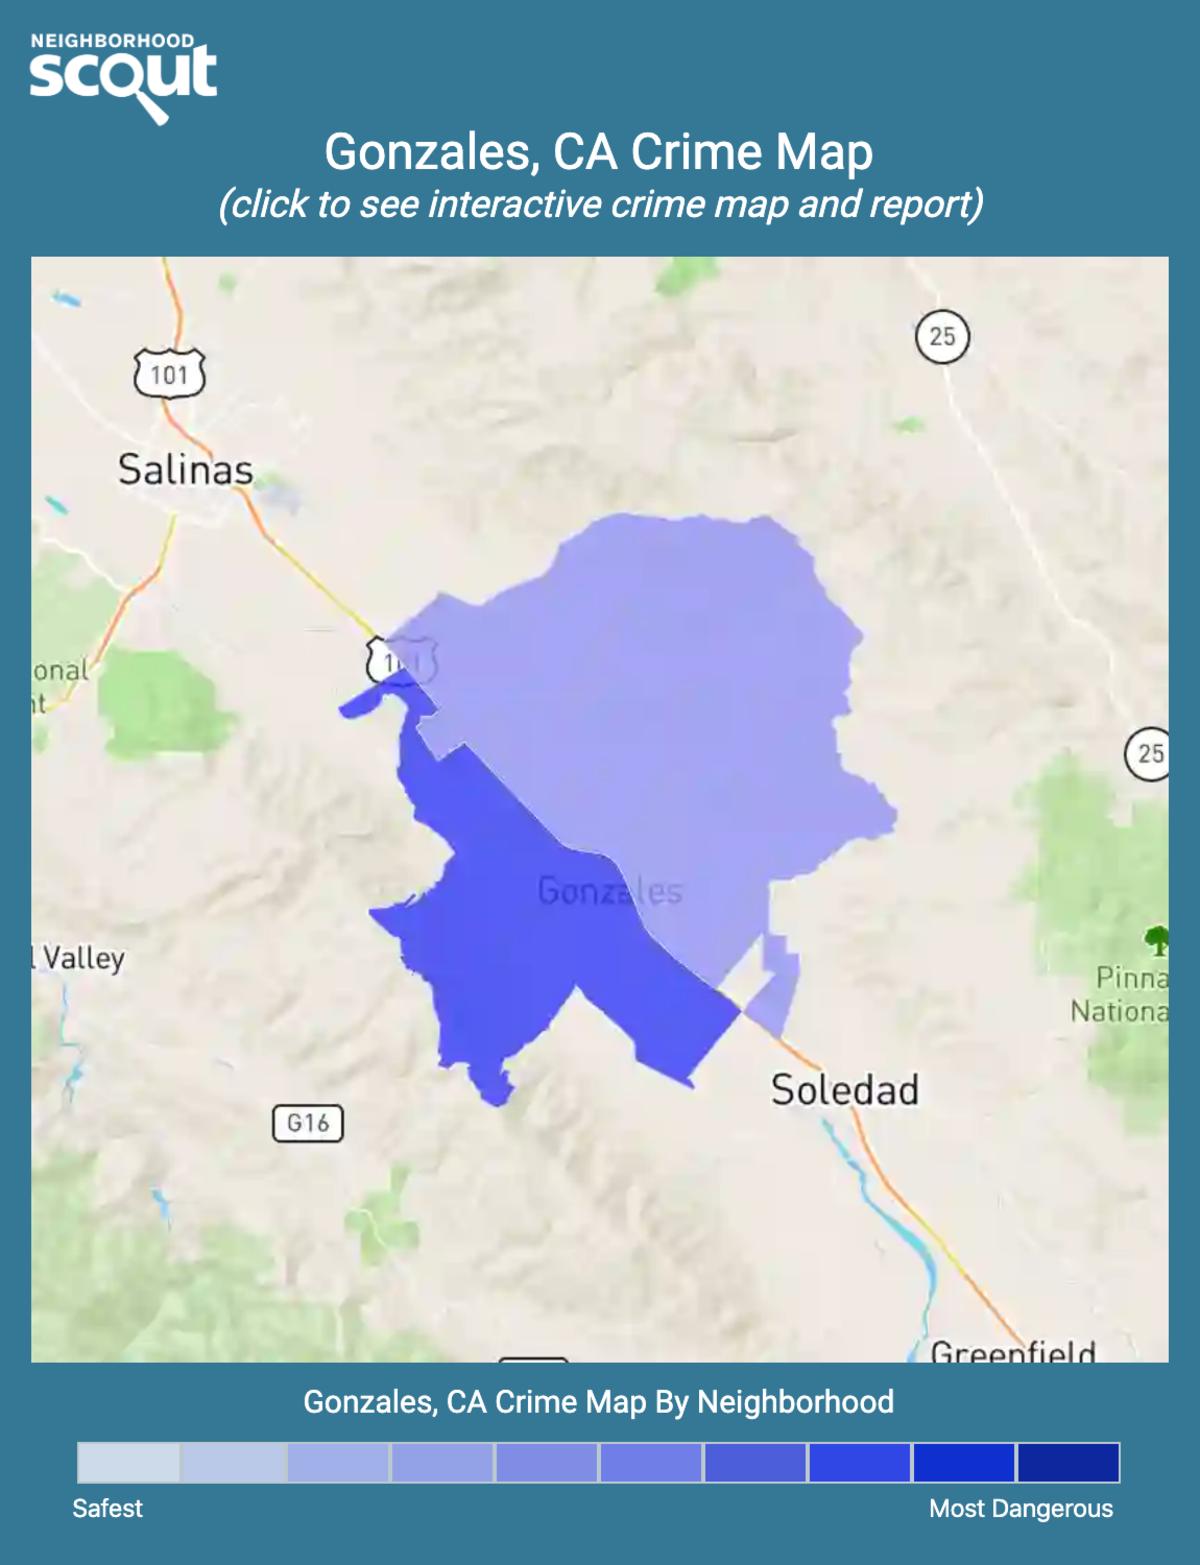 Gonzales, California crime map